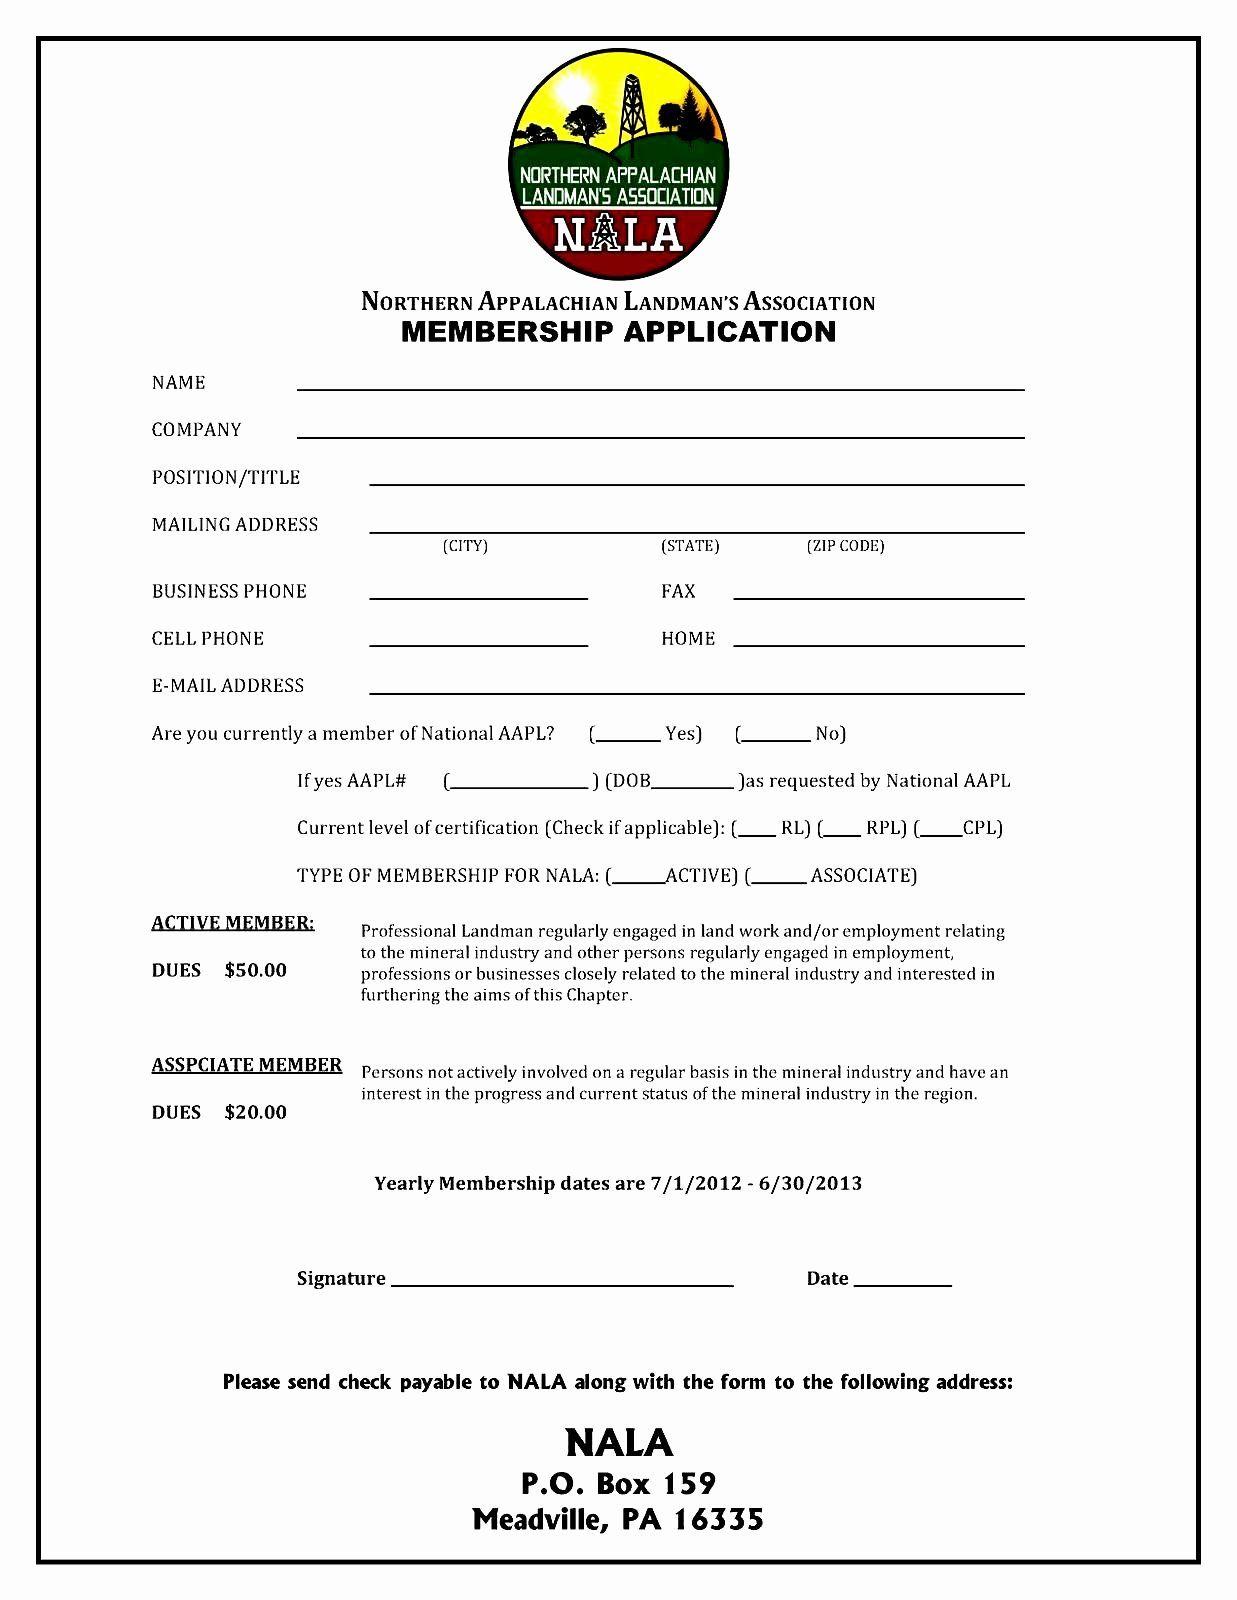 Membership Form Template Word Elegant Membership Application Template Emmamcintyrephotograp Signs Youre In Love Business Card Template Design Membership Card